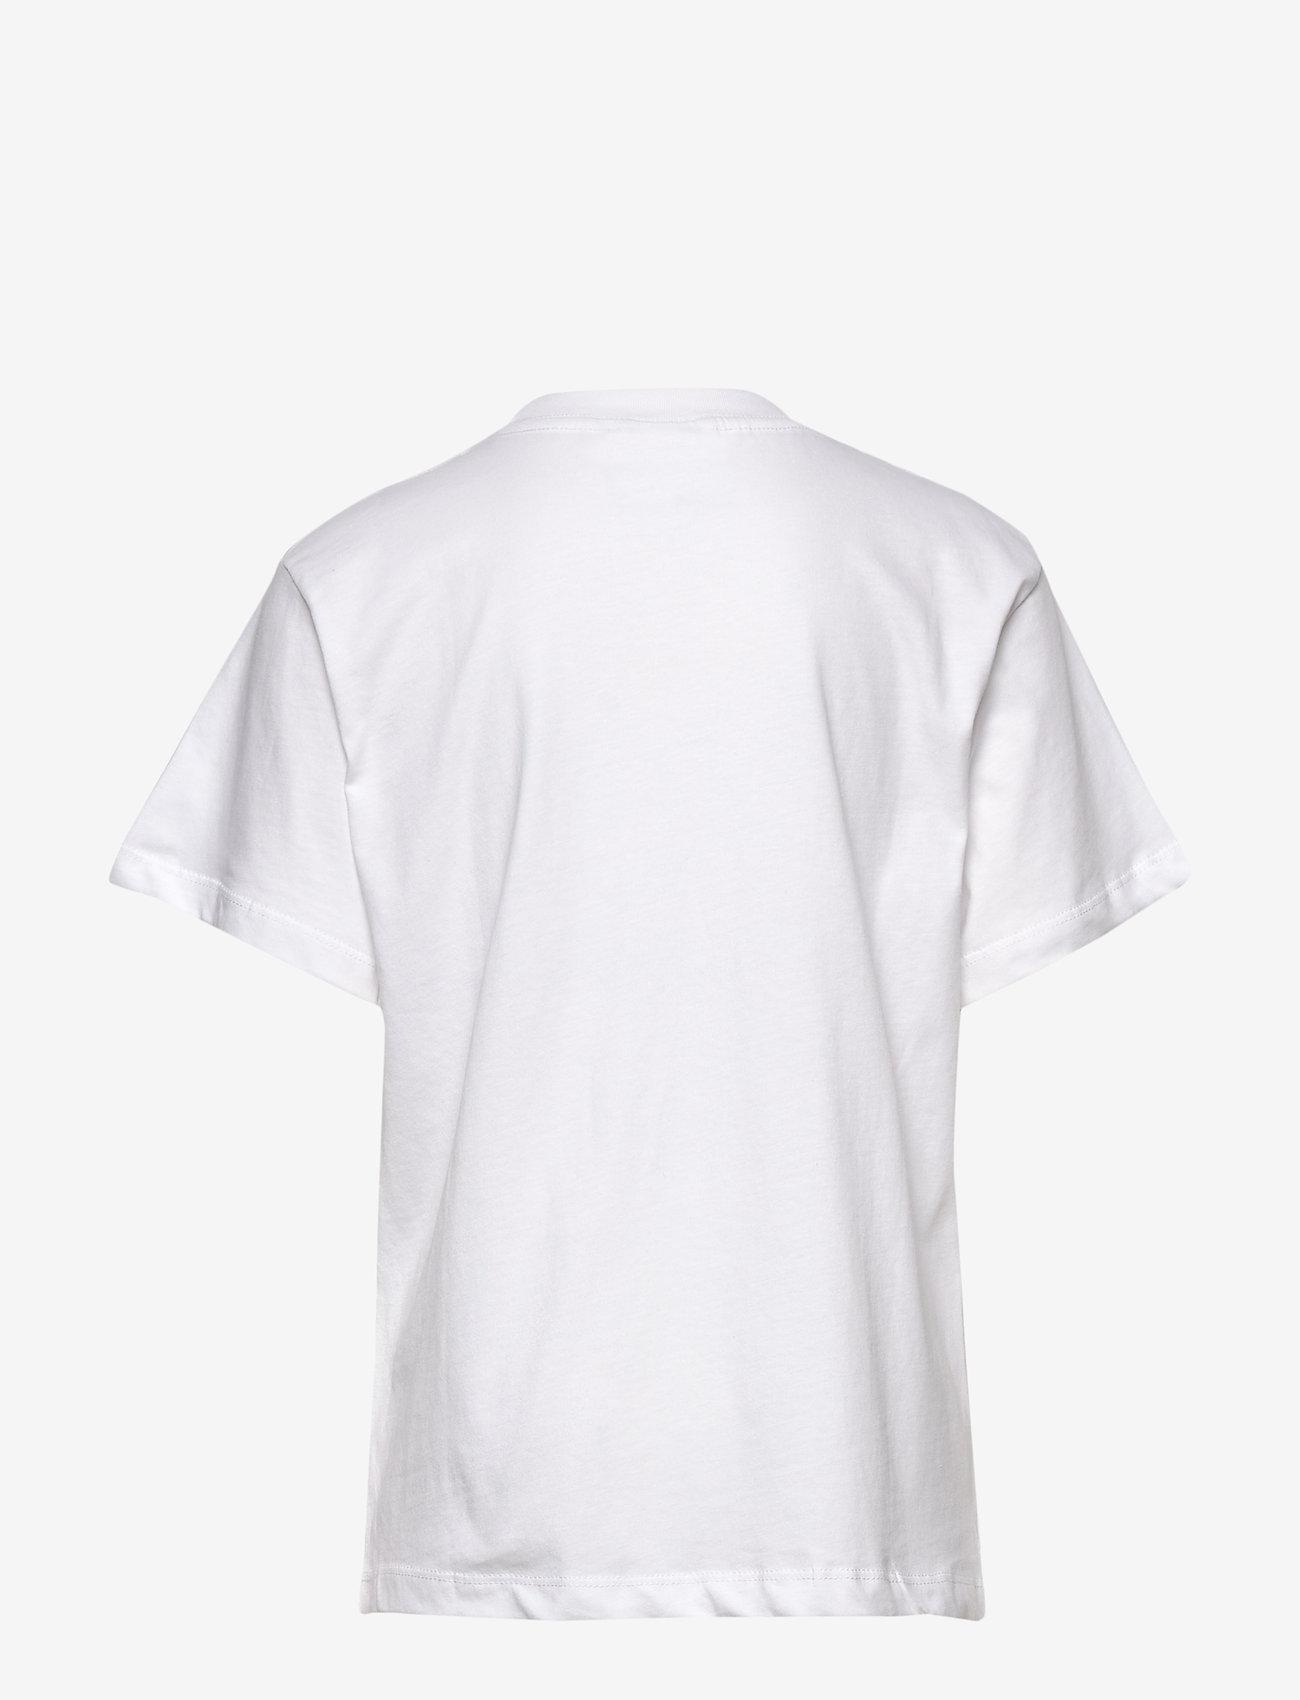 Petit by Sofie Schnoor - T-shirt - kortærmede - white - 1